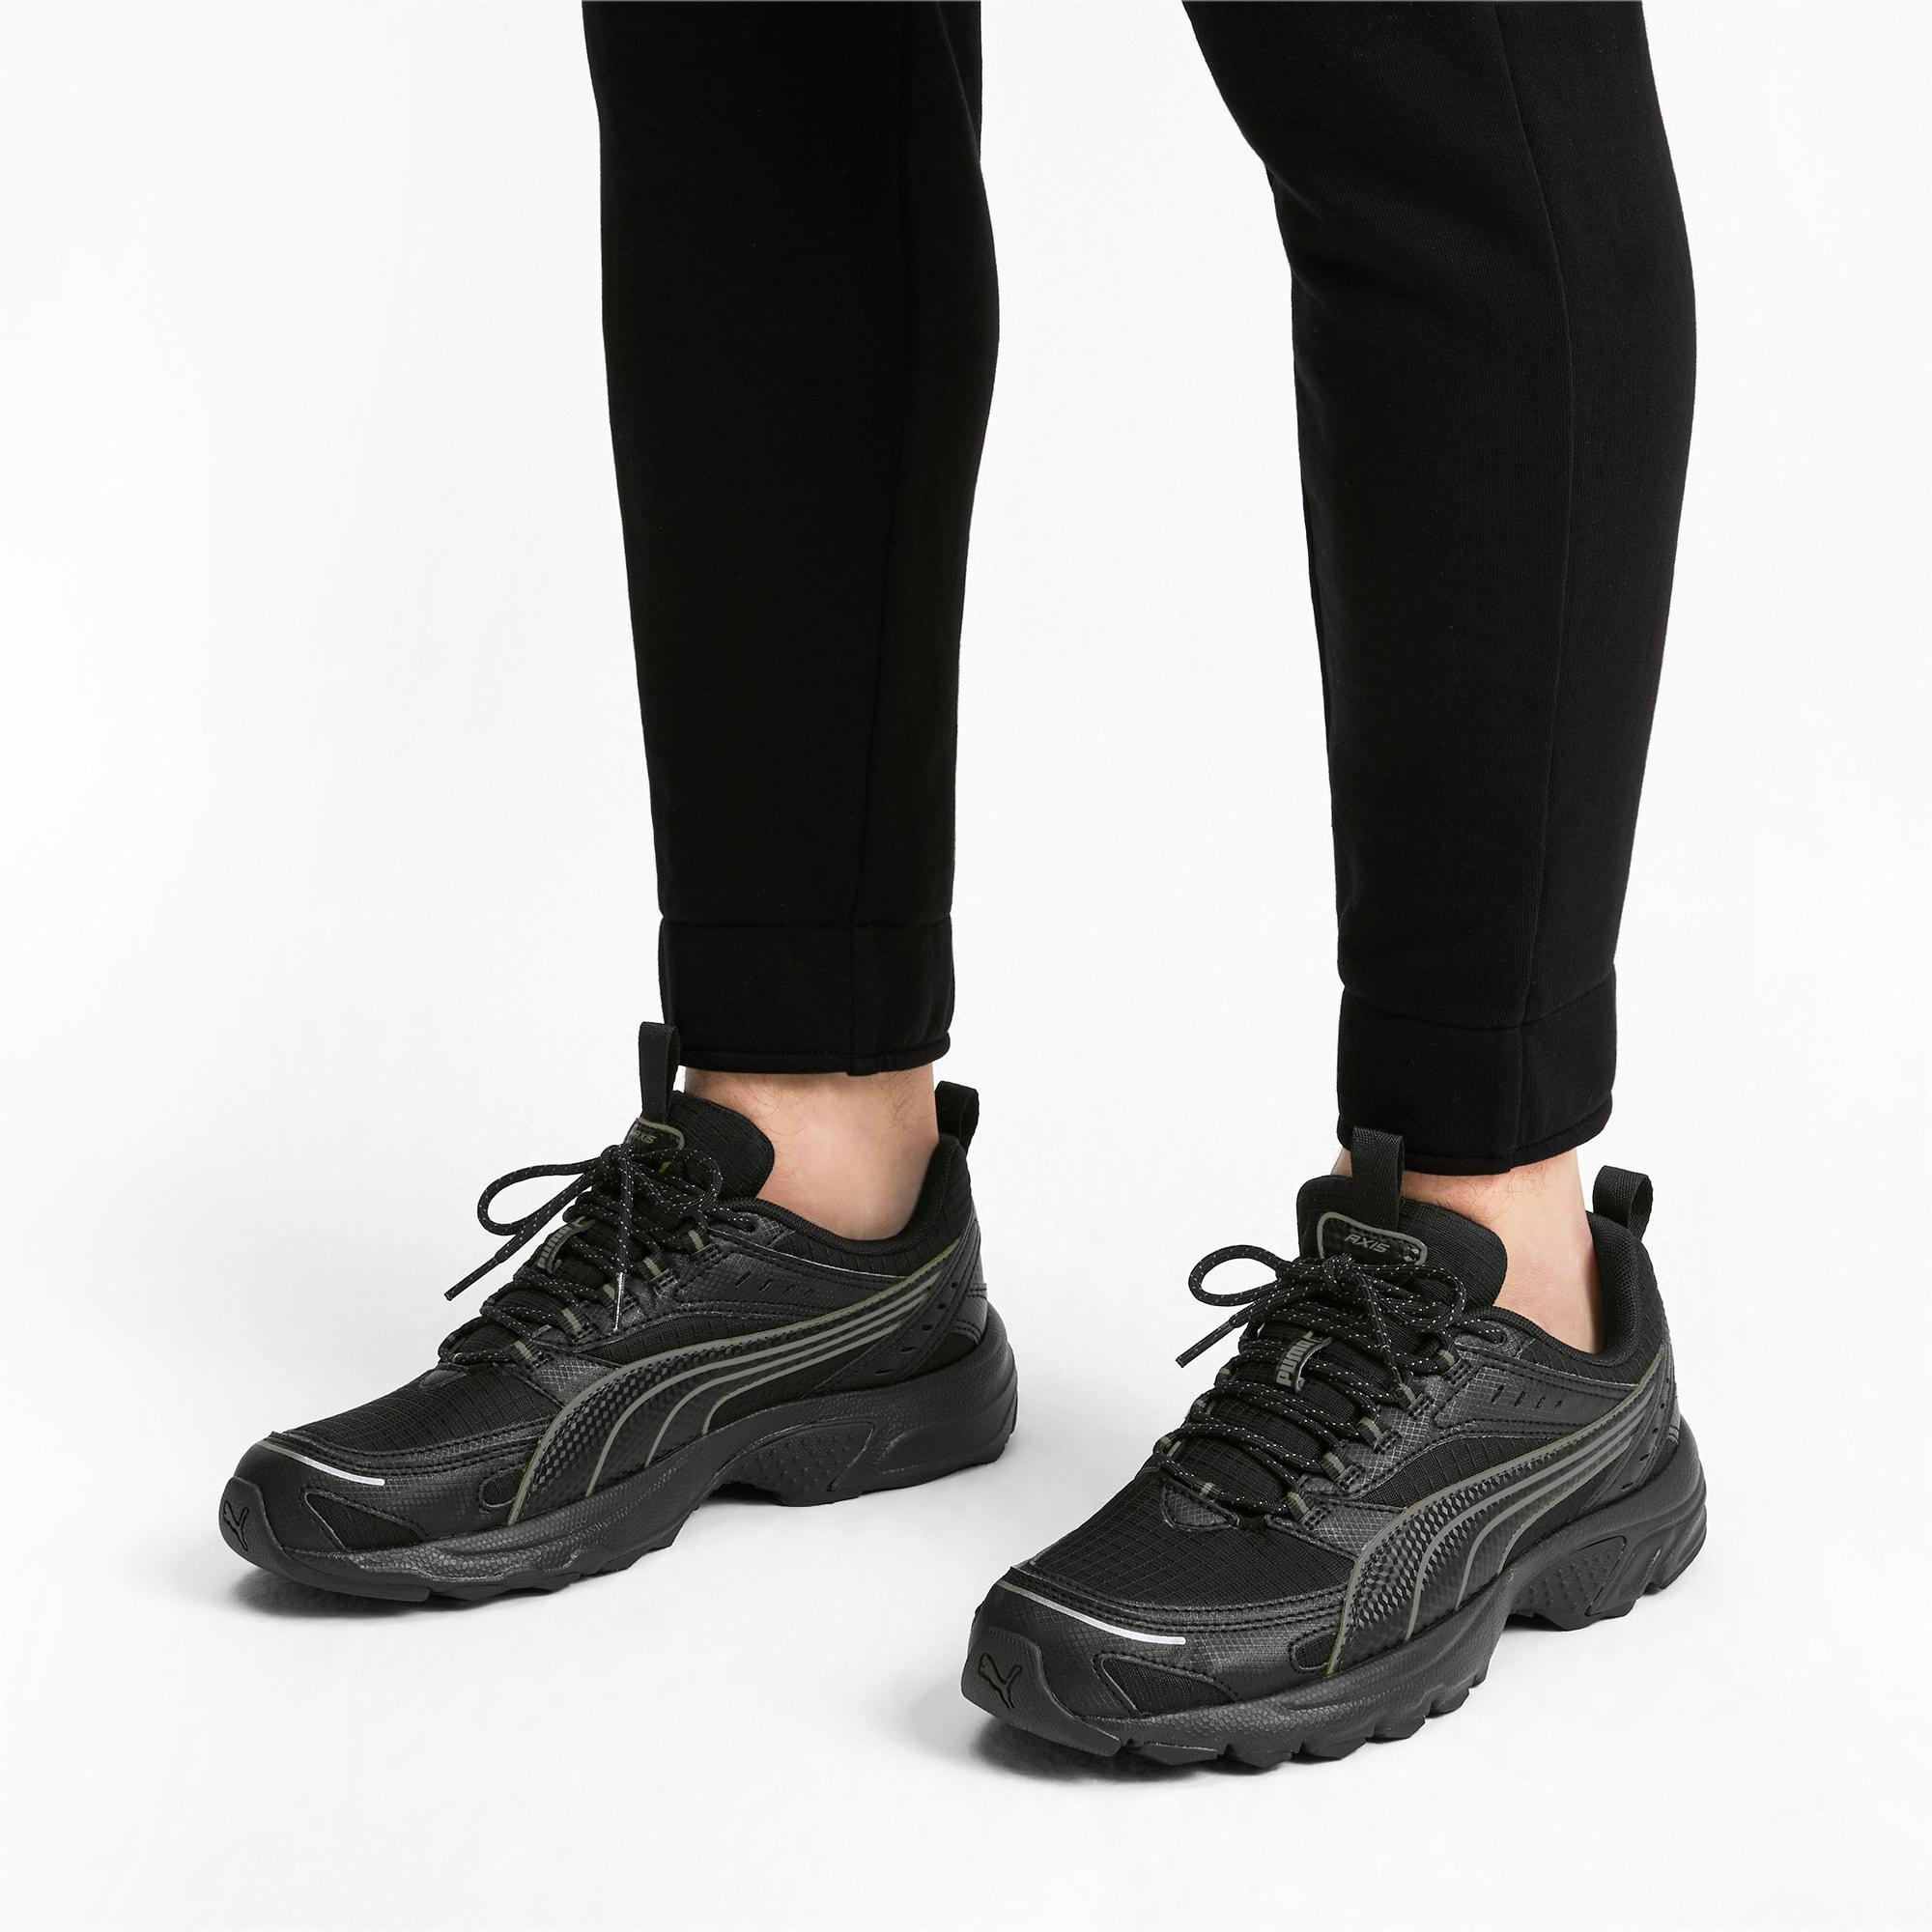 Thumbnail 2 of Axis Trail Sneakers, Puma Black-CASTLEROCK-Silver, medium